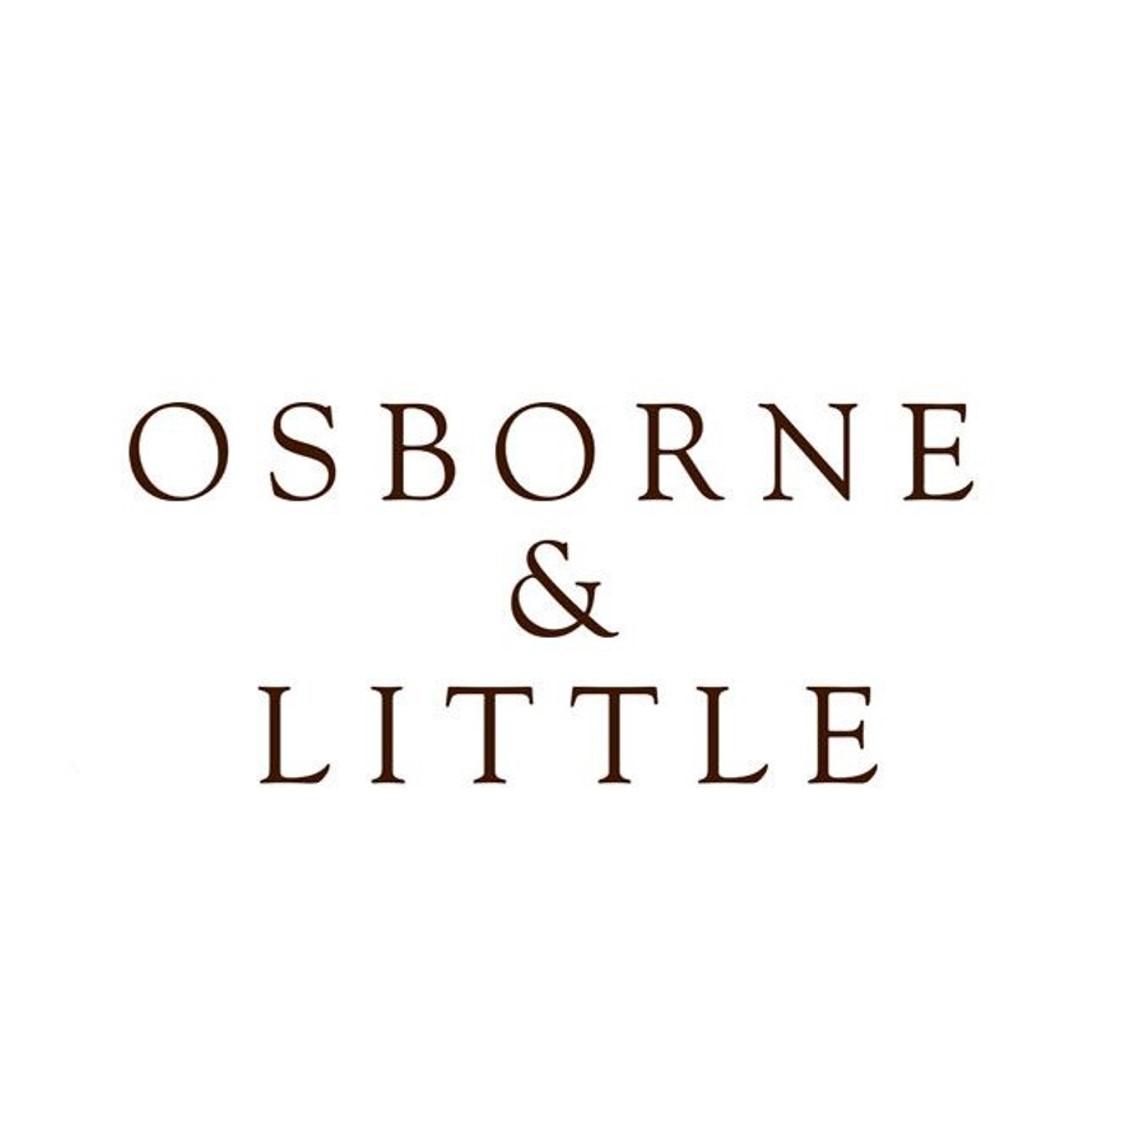 https://anafexmainteriorismo.com/wp-content/uploads/2018/06/Osborne-Little.jpg